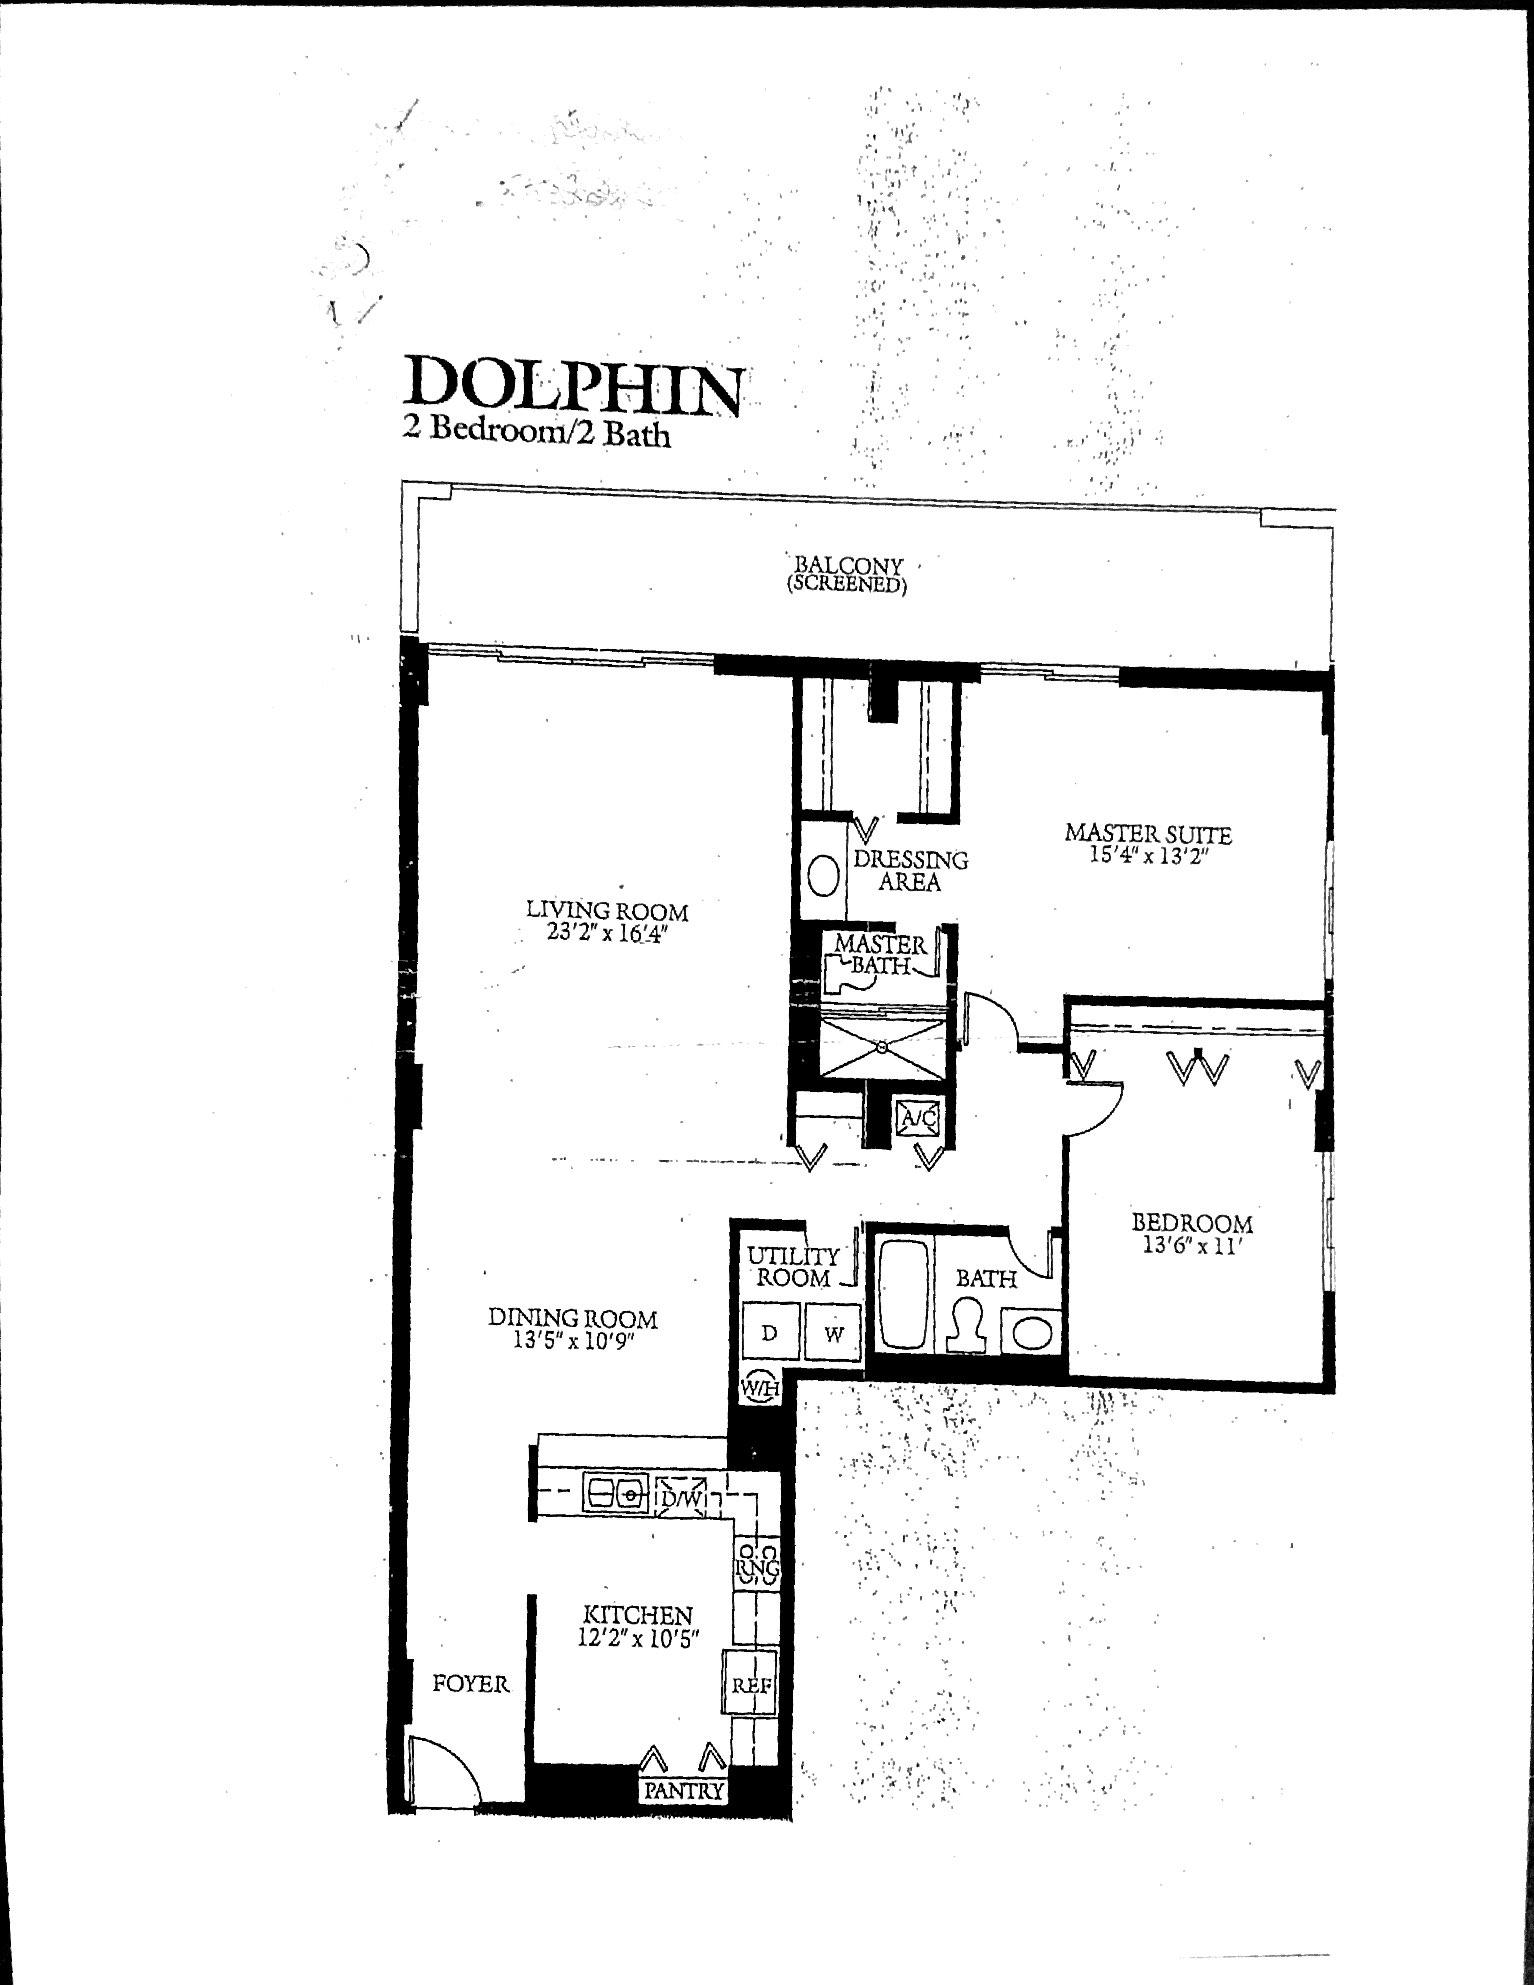 Coronado's Dolphin Floor Plan